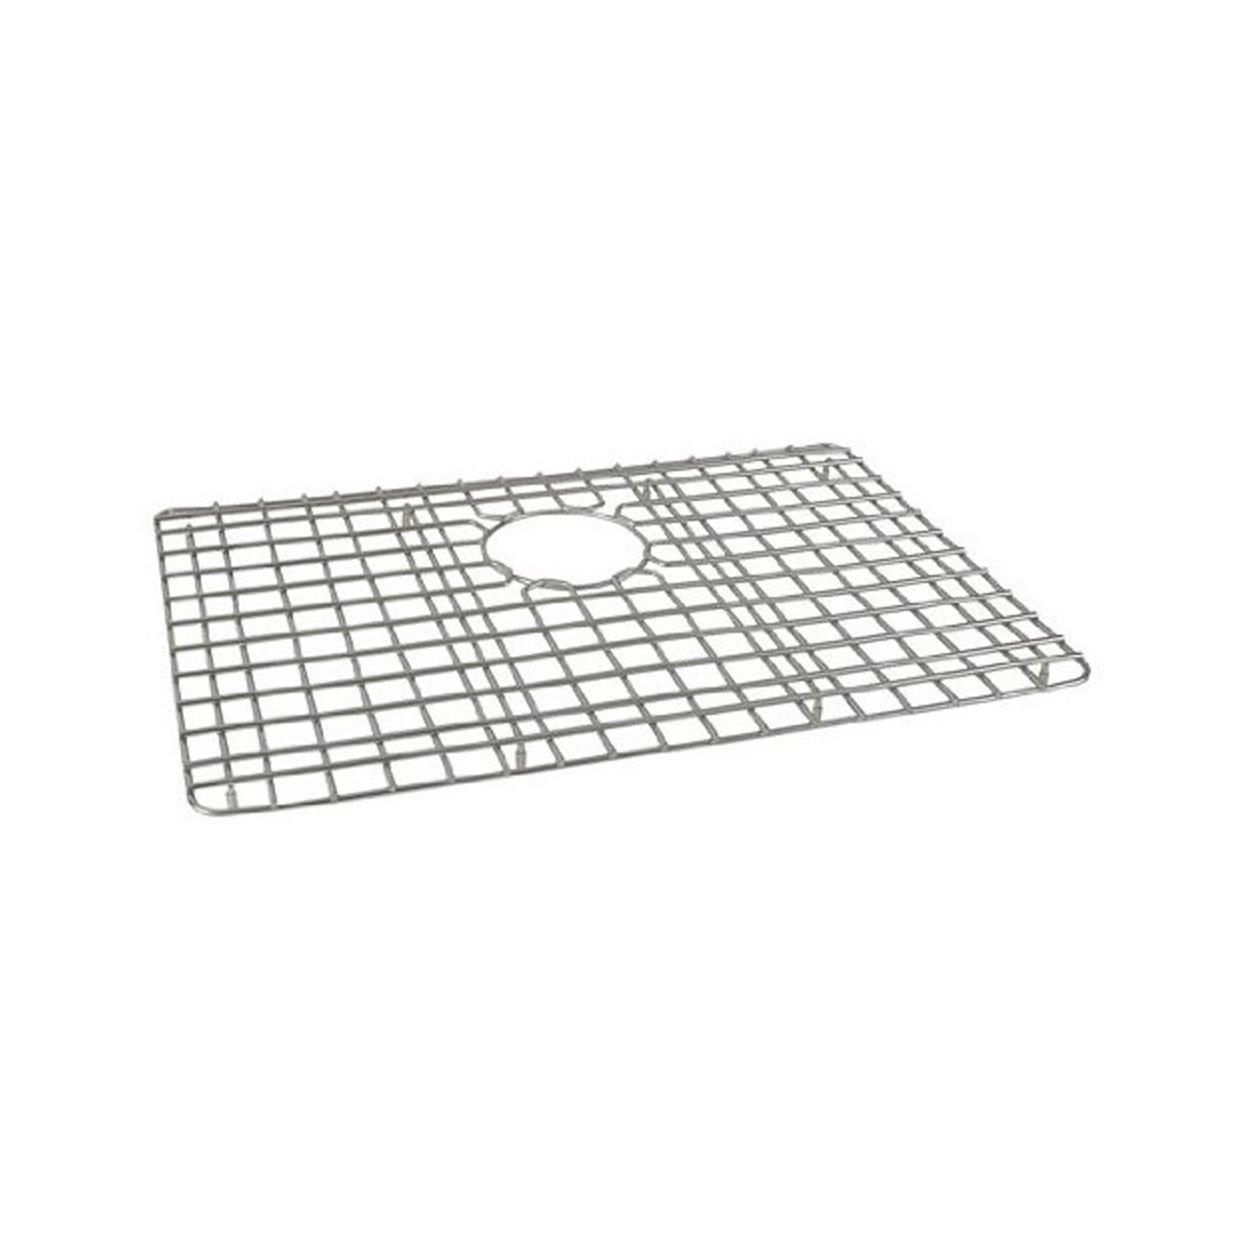 Franke Professional Series Bottom Sink Grid for PSX120309